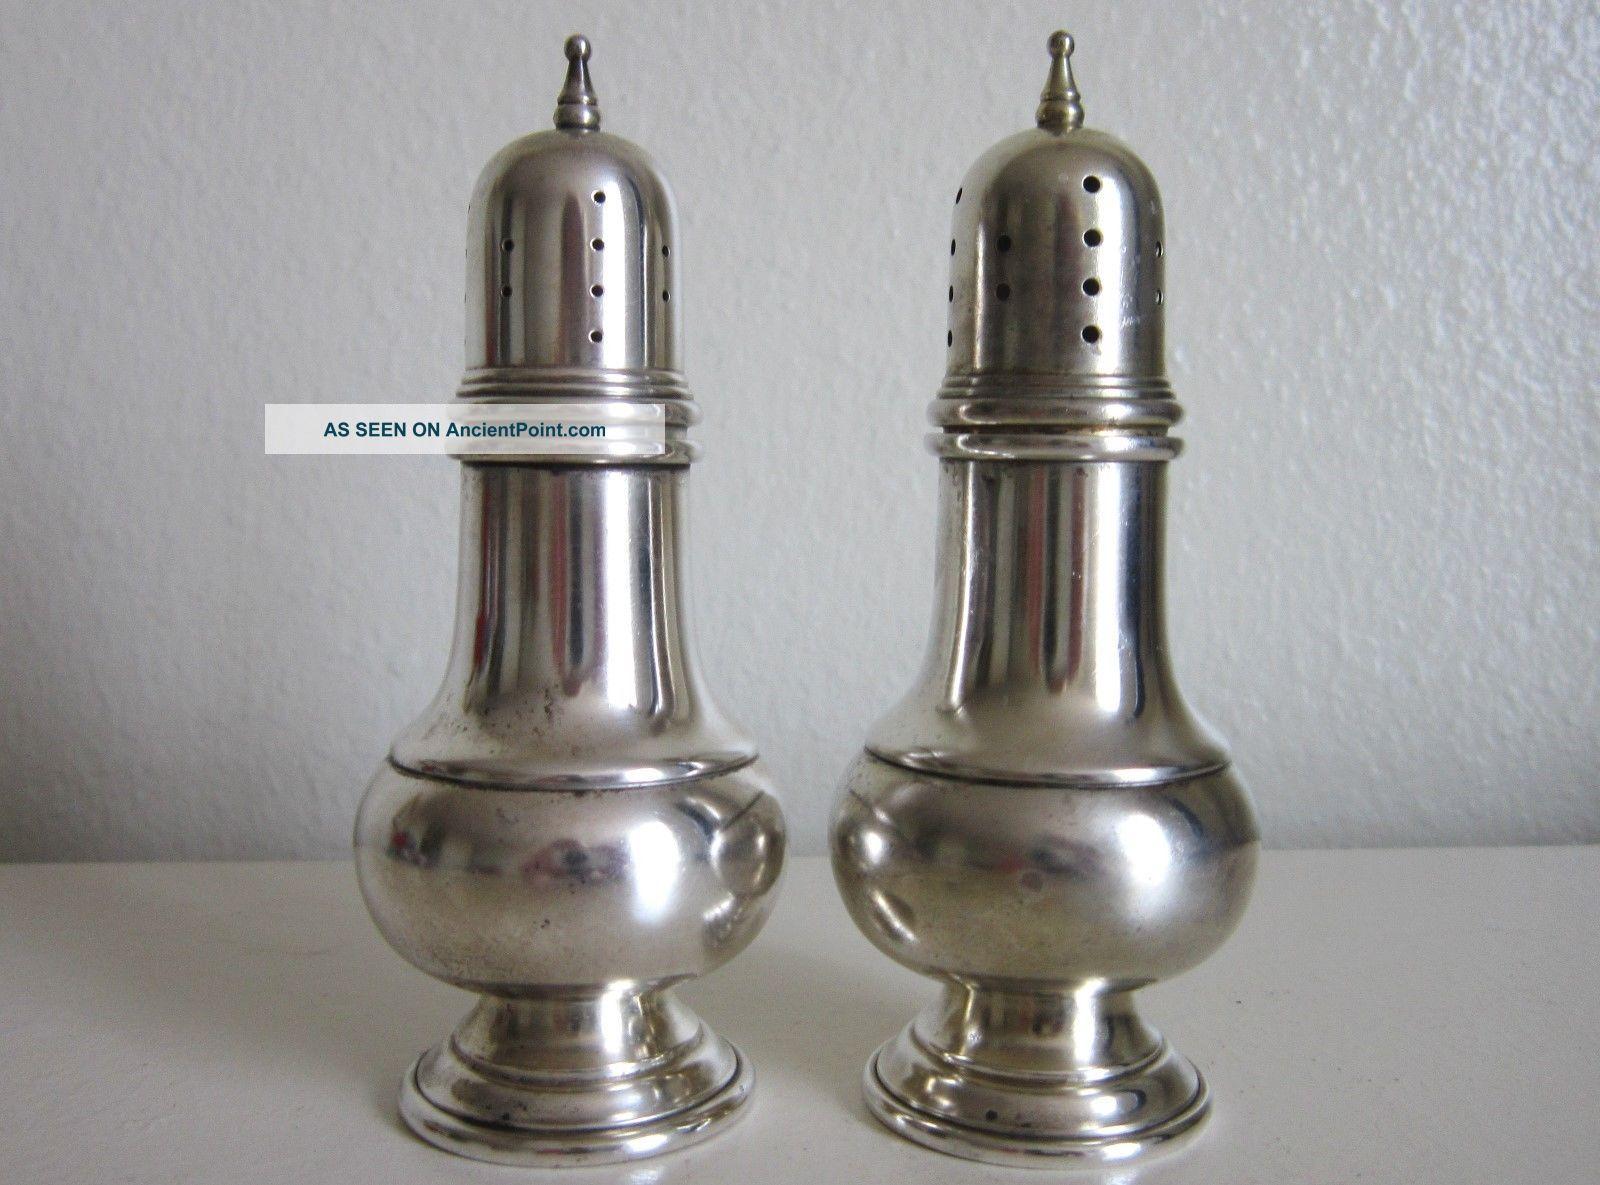 Vintage Sterling Silver Salt & Pepper Shakers A.  T.  Gunner & Co Salt & Pepper Shakers photo